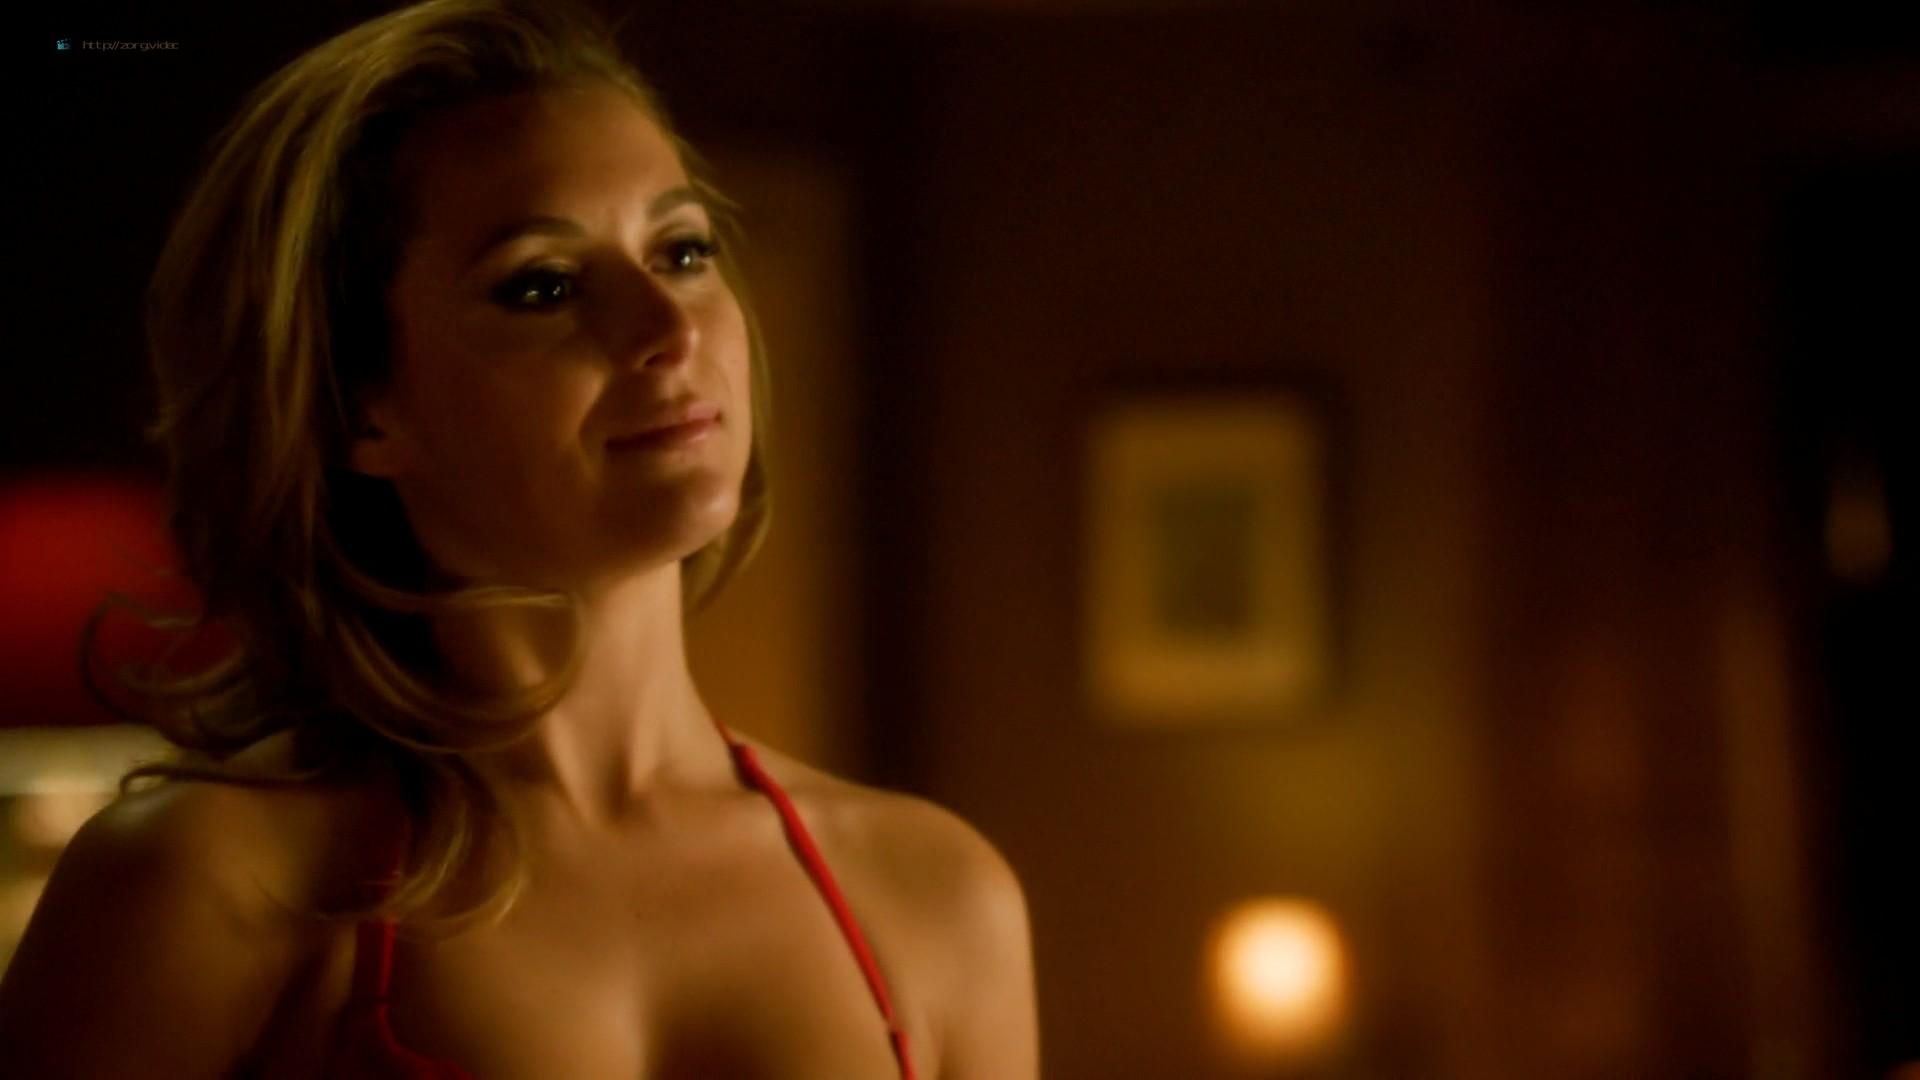 Alexa Vega hot and some sex - The Tomorrow People (2014) s1e18-19 HD (4)